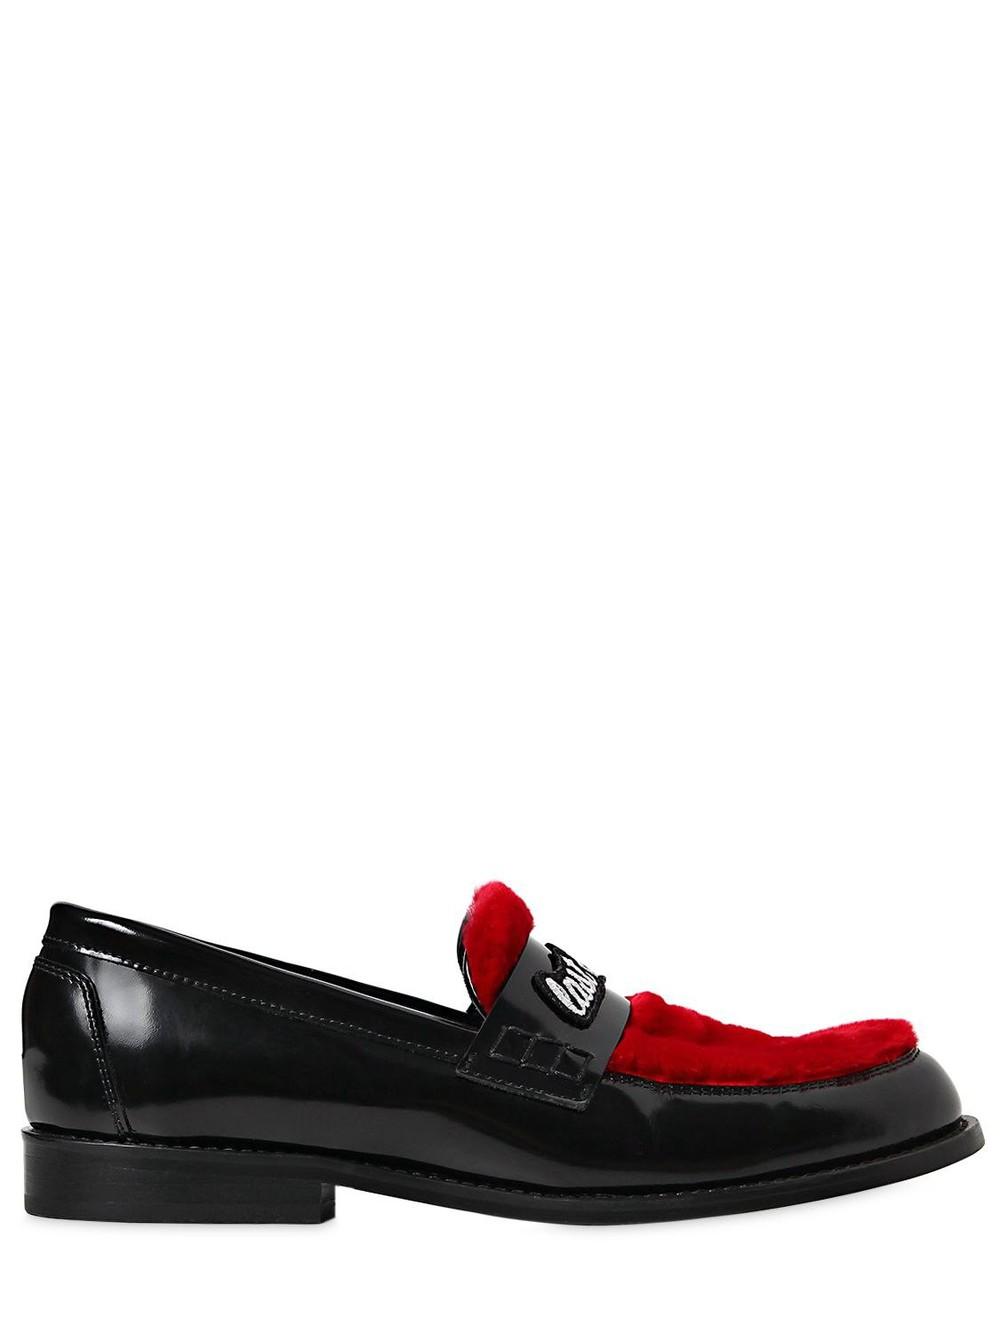 JOSHUA SANDERS 20mm Last Dance Leather Loafers in black / red